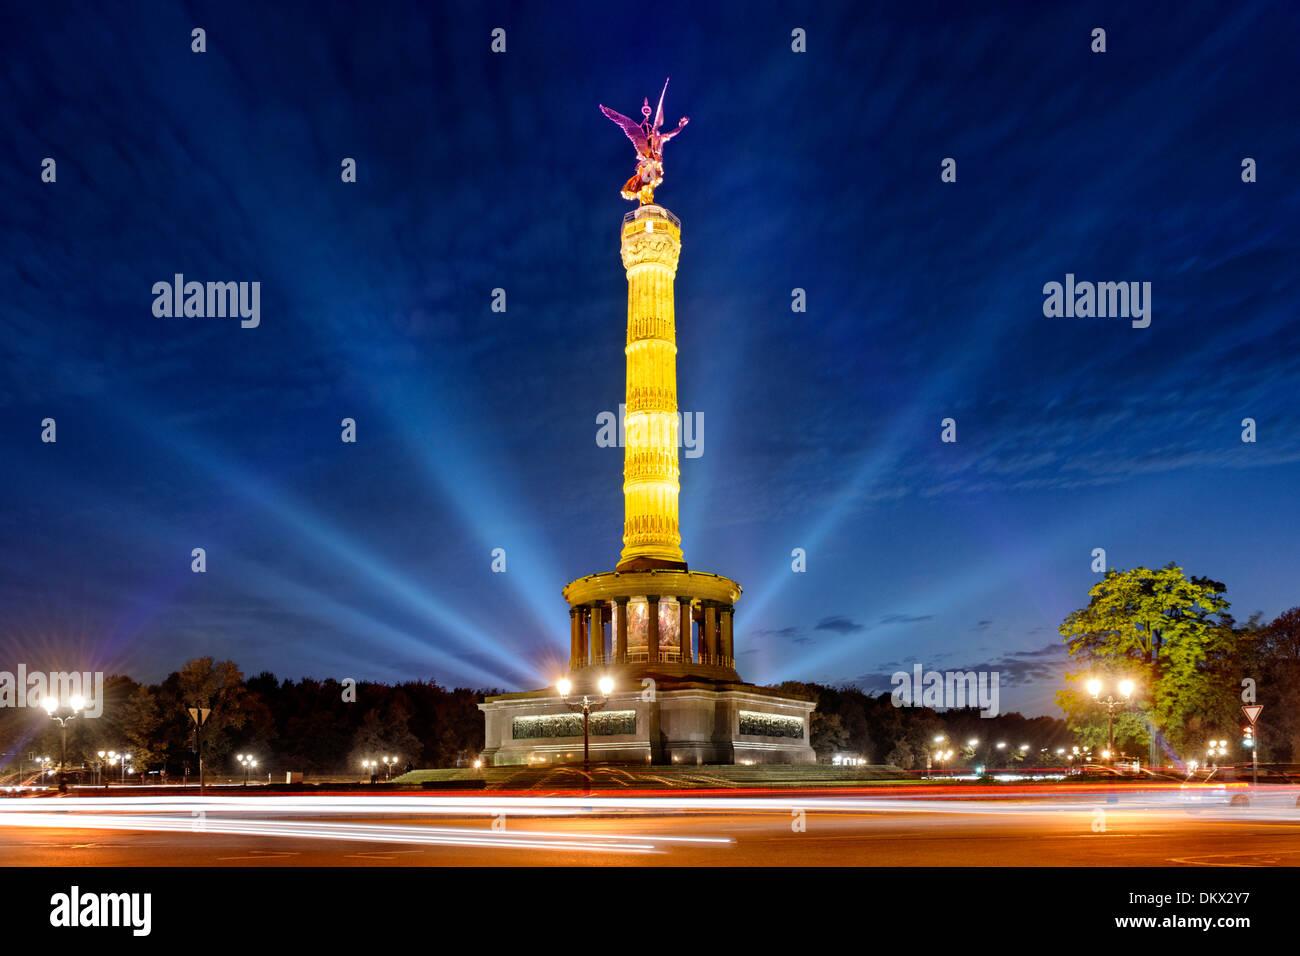 Illuminated Victory Column, Tiergarten, Mitte district, Berlin, Germany - Stock Image